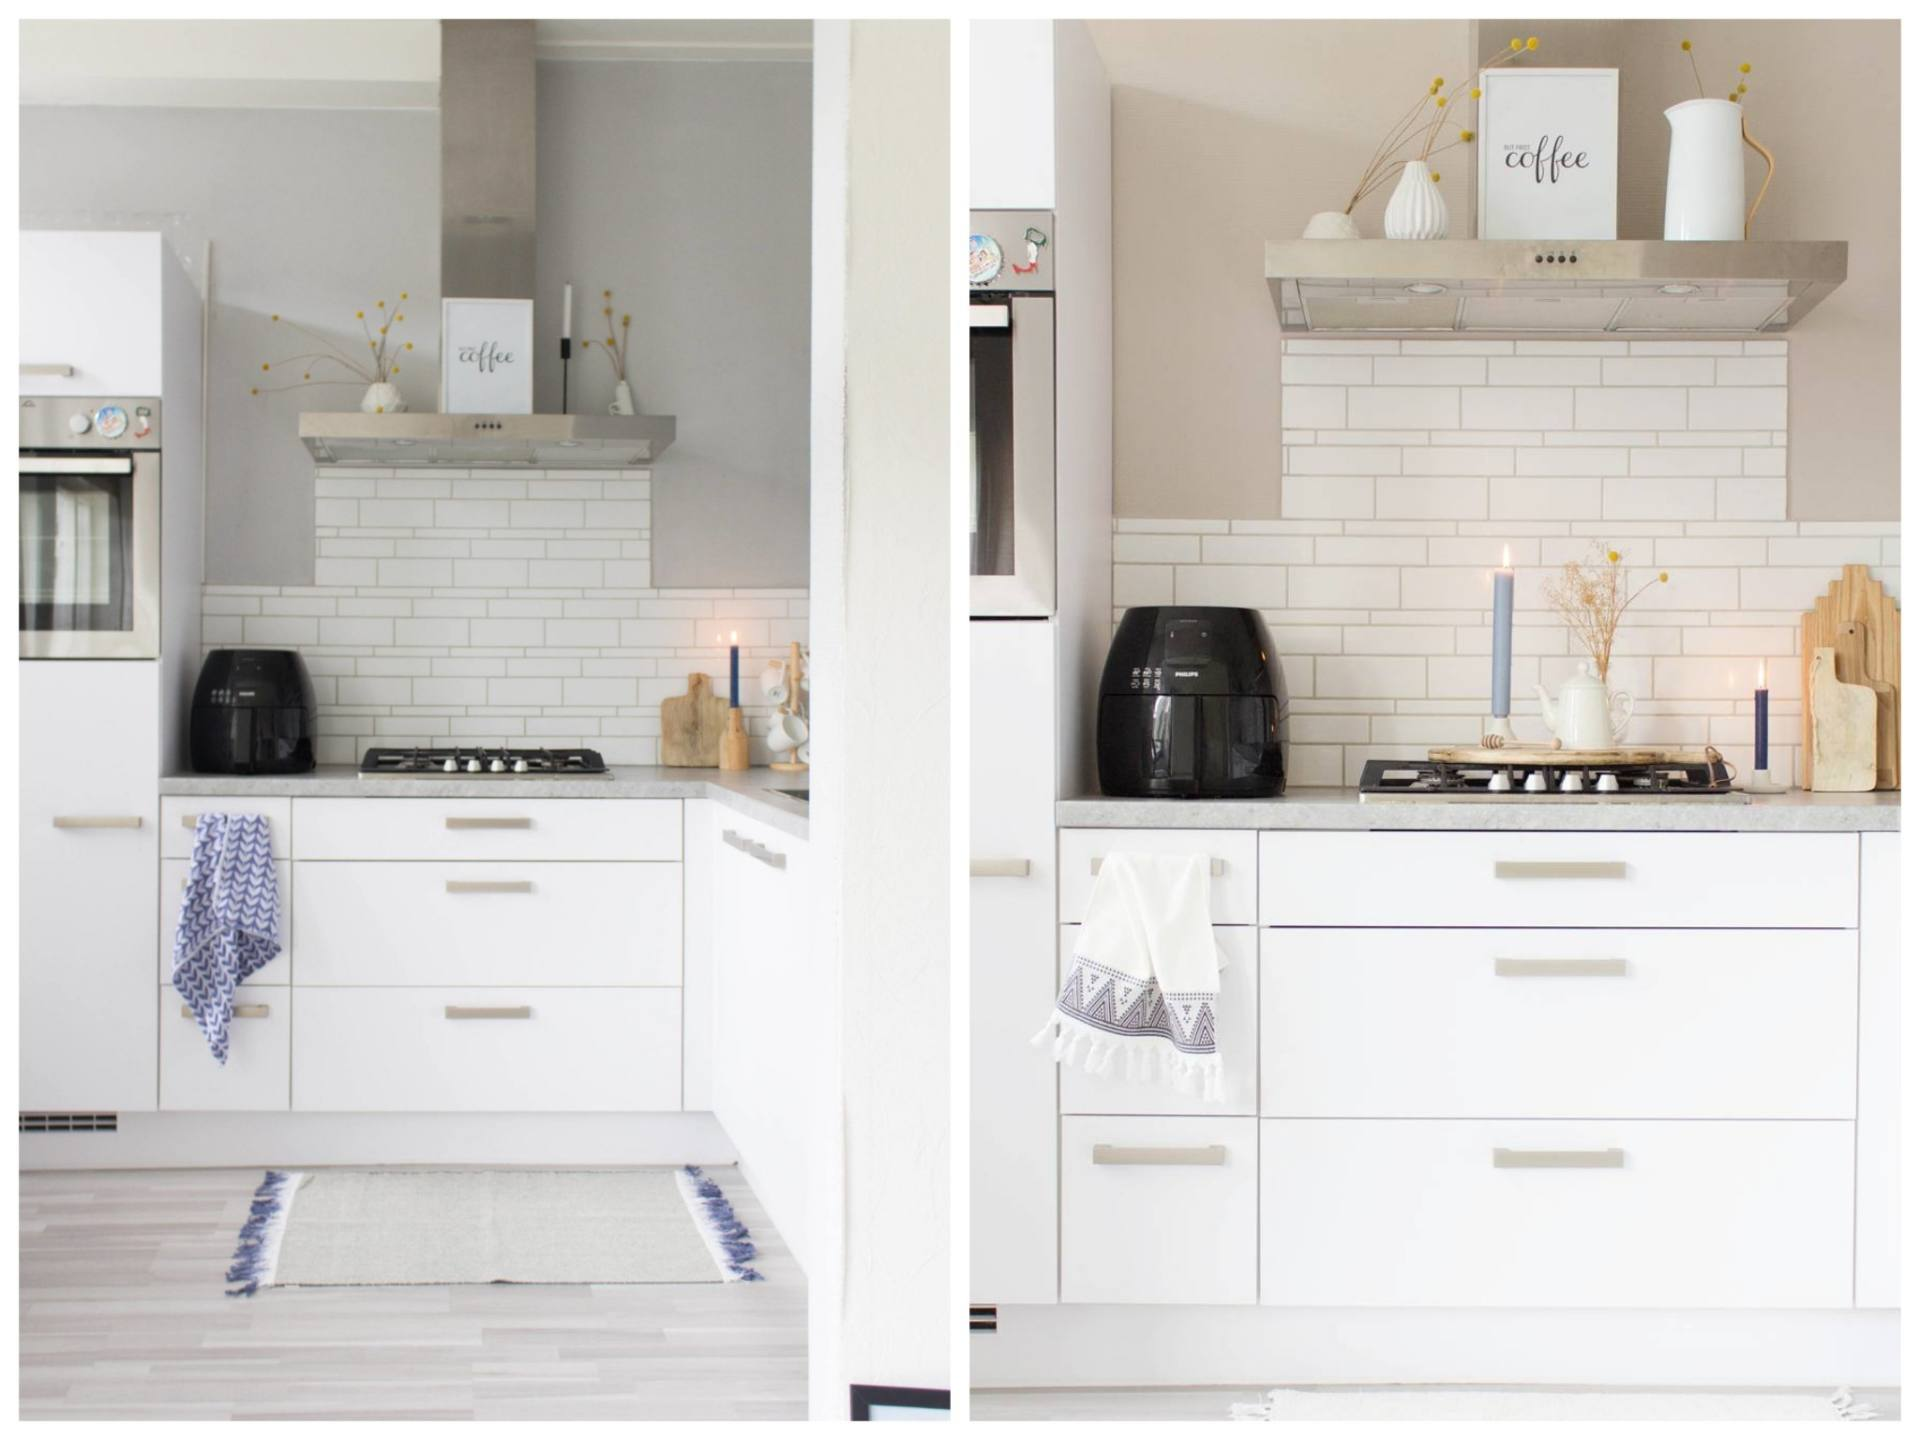 interieurverandering keuken